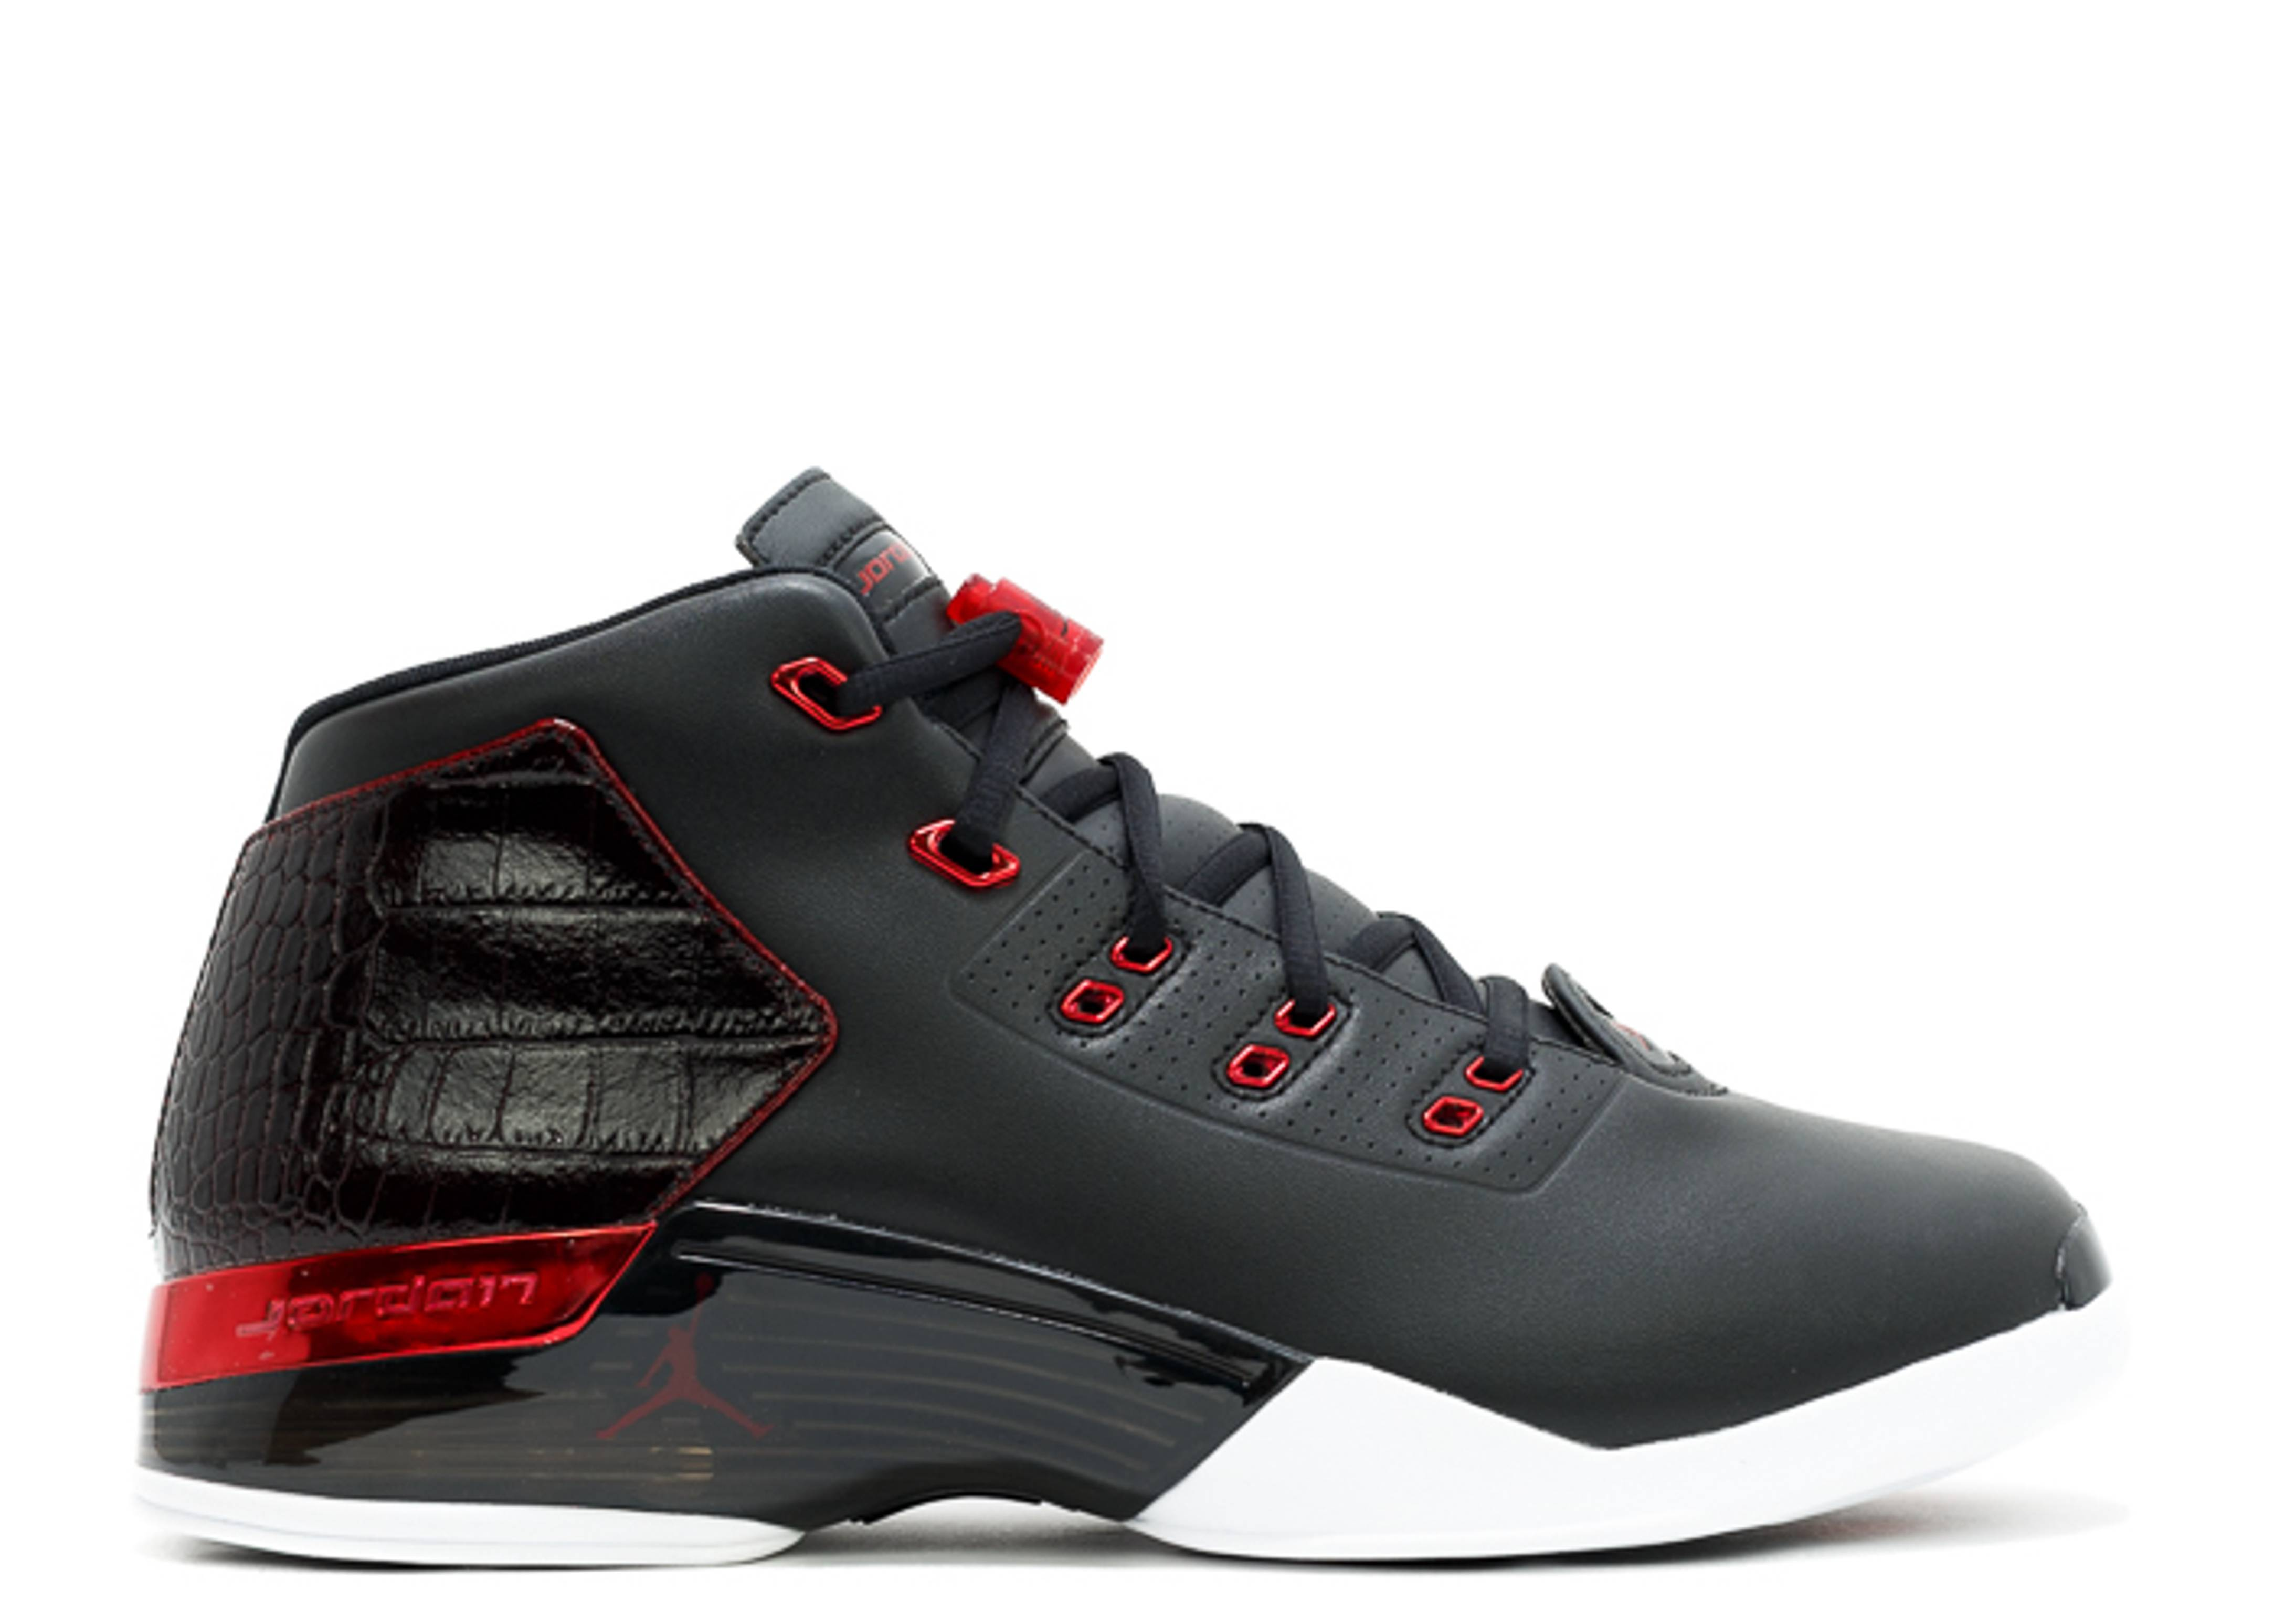 Air Jordan 17 Retro Quot Bulls Quot Black Gym Red White